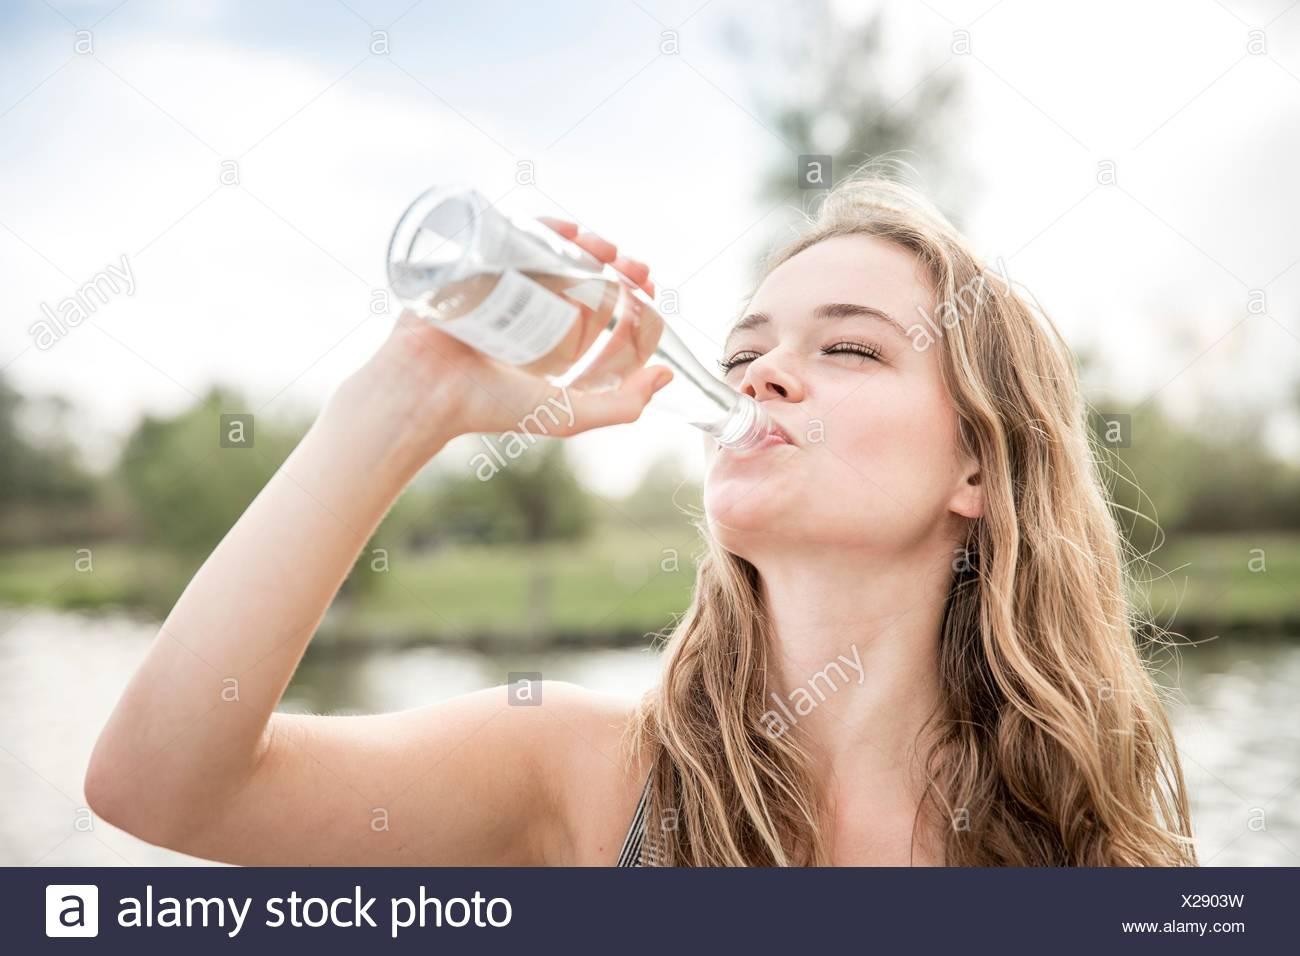 Mujer joven de beber agua de botella, al aire libre Imagen De Stock